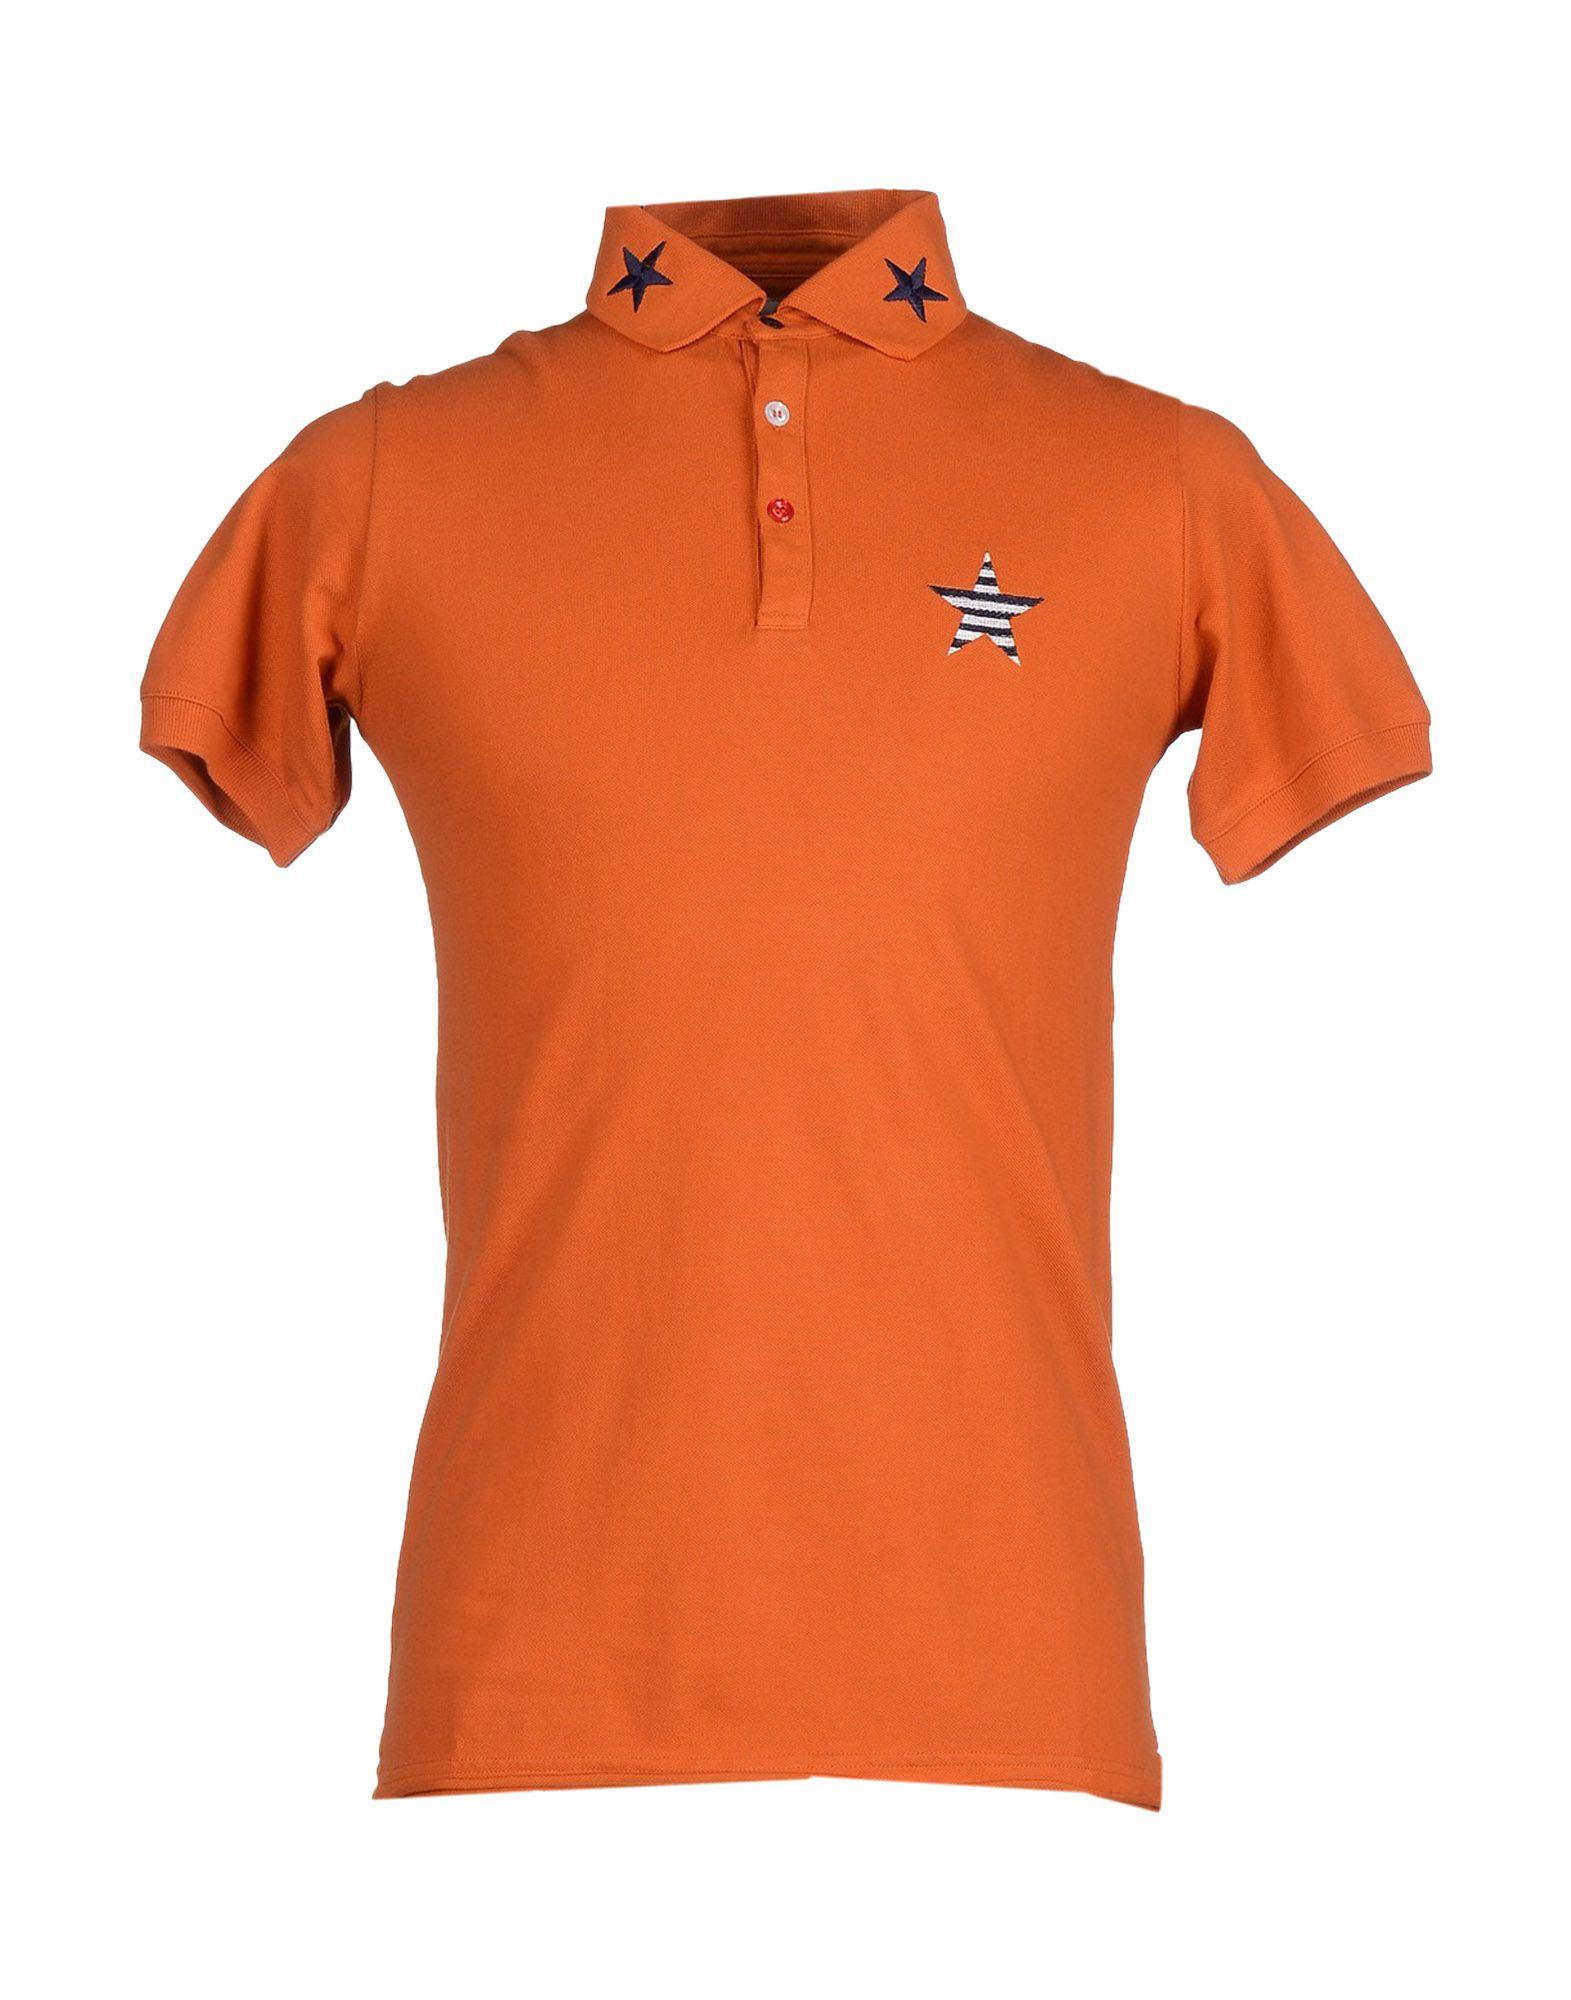 Macchia j polo shirt in orange for men save 60 lyst for Orange polo shirt mens